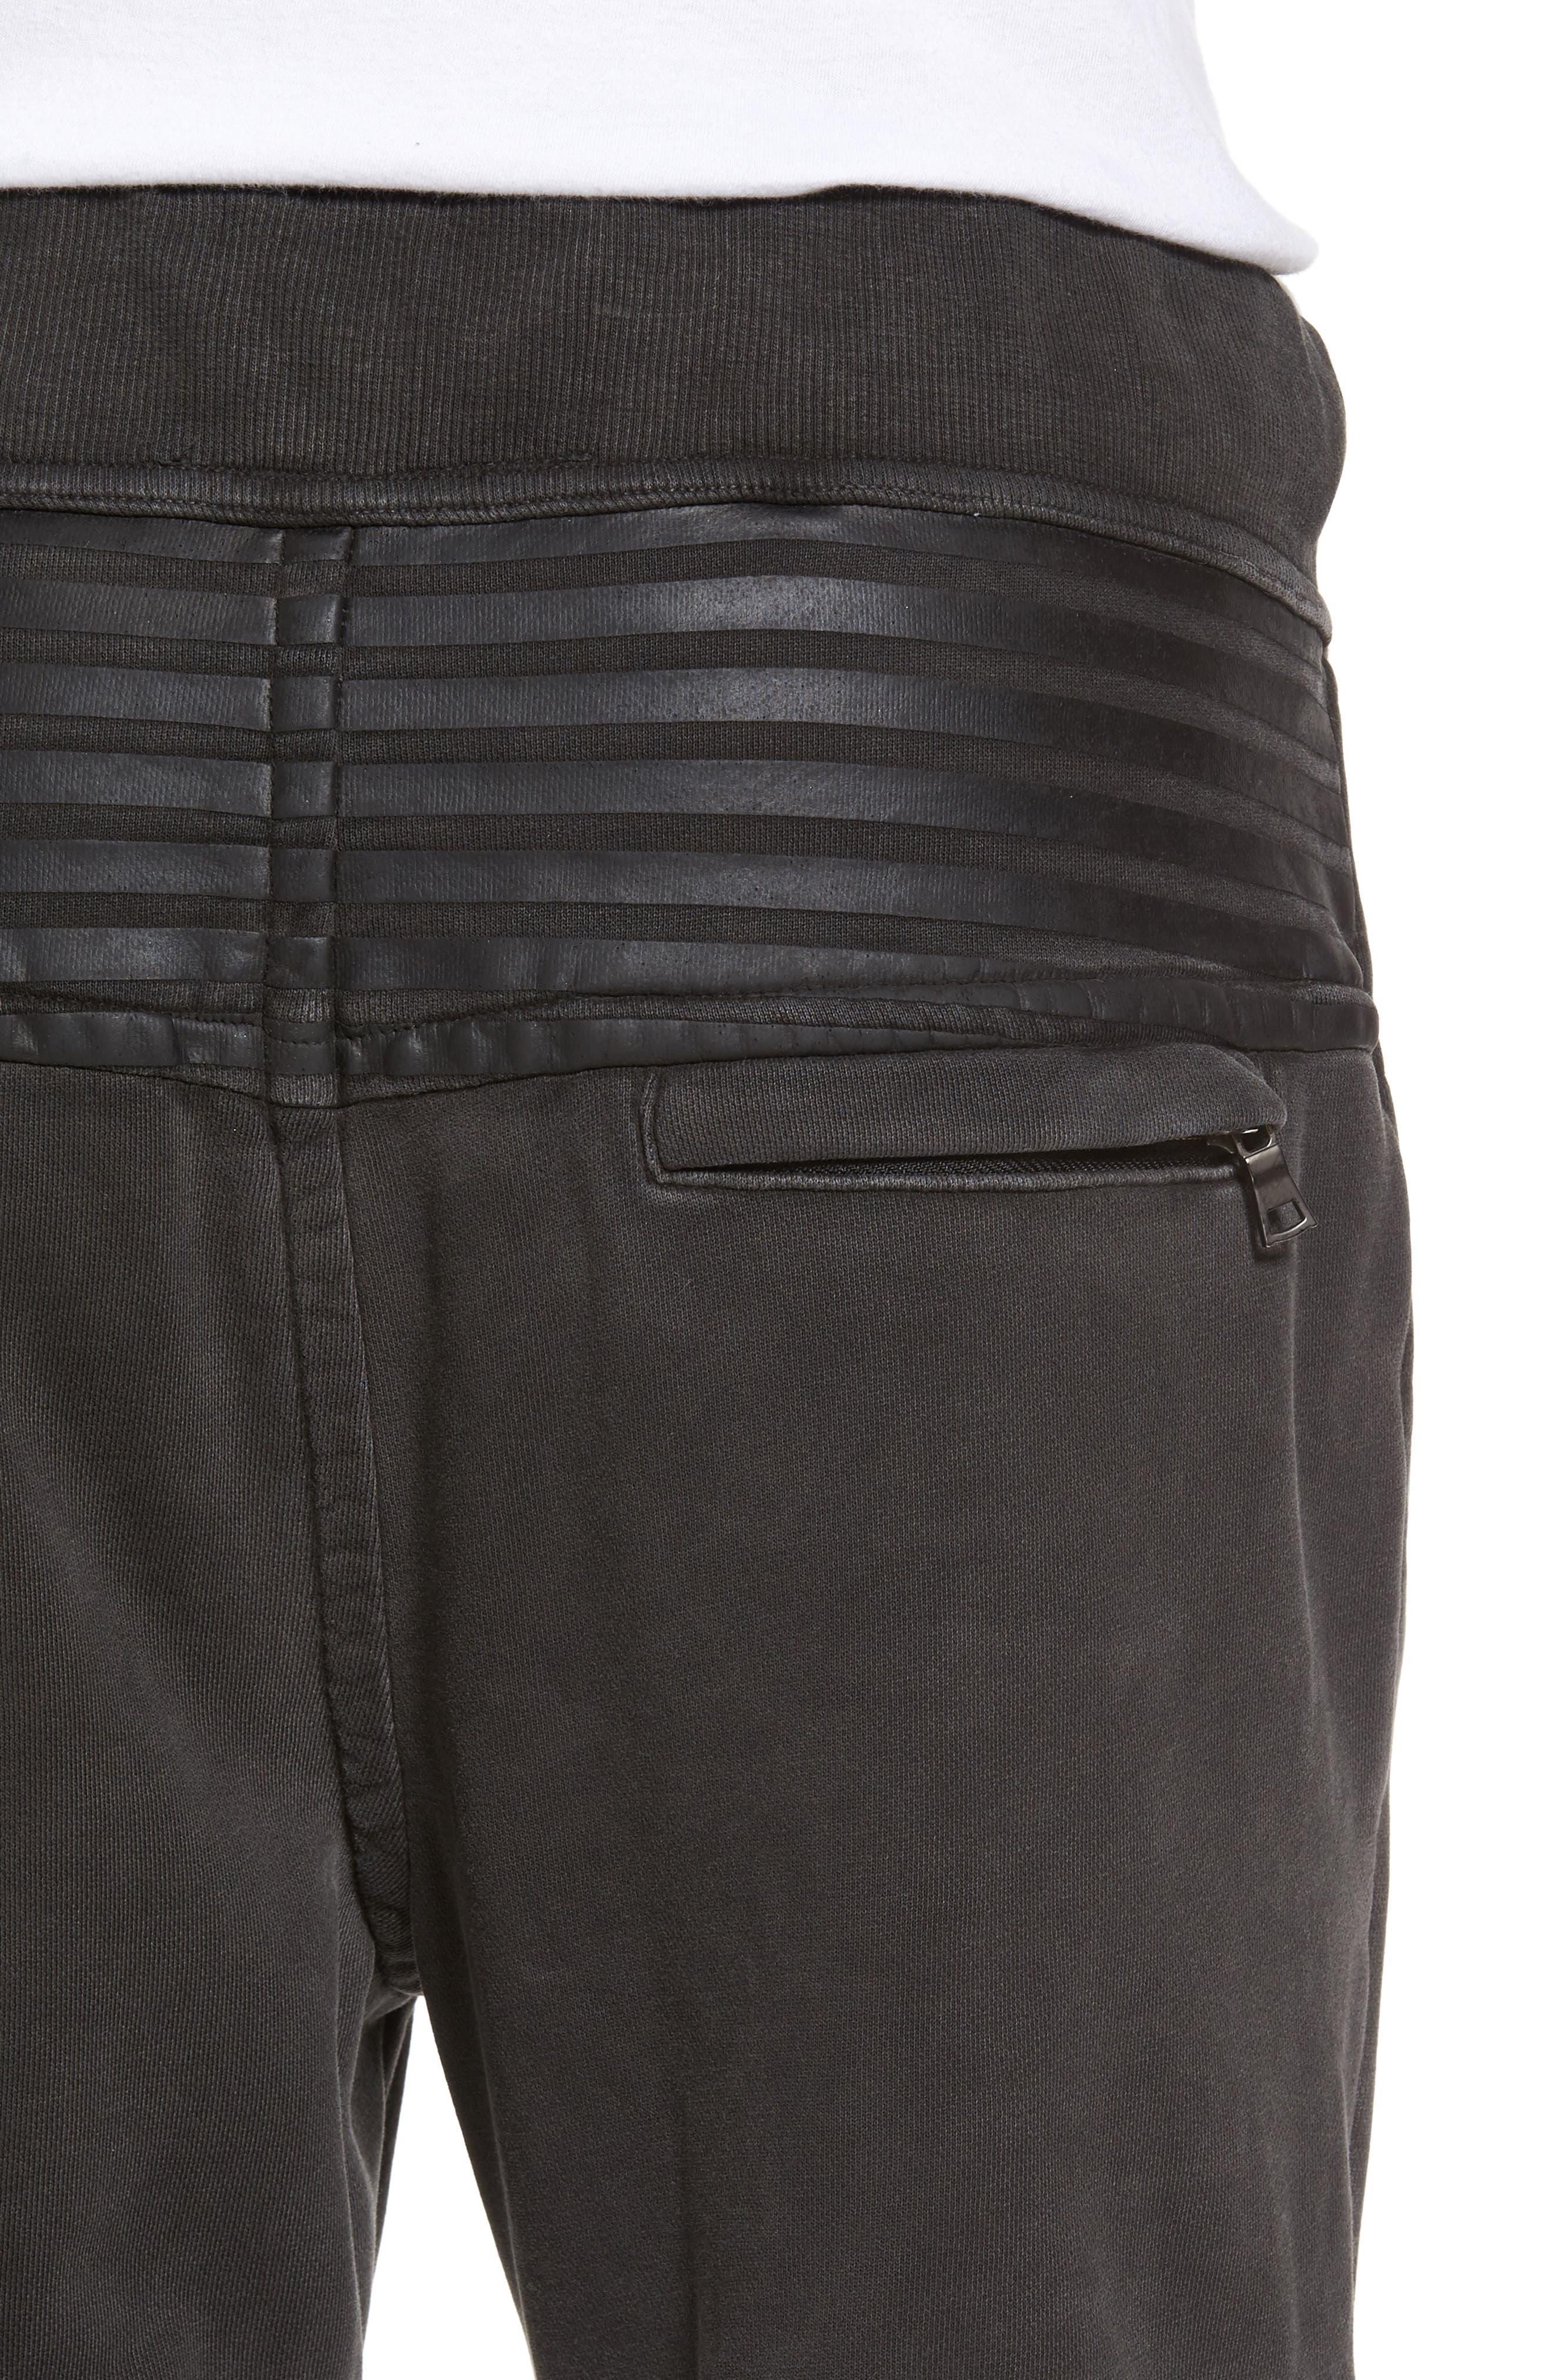 Moto Sweatpants,                             Alternate thumbnail 4, color,                             001